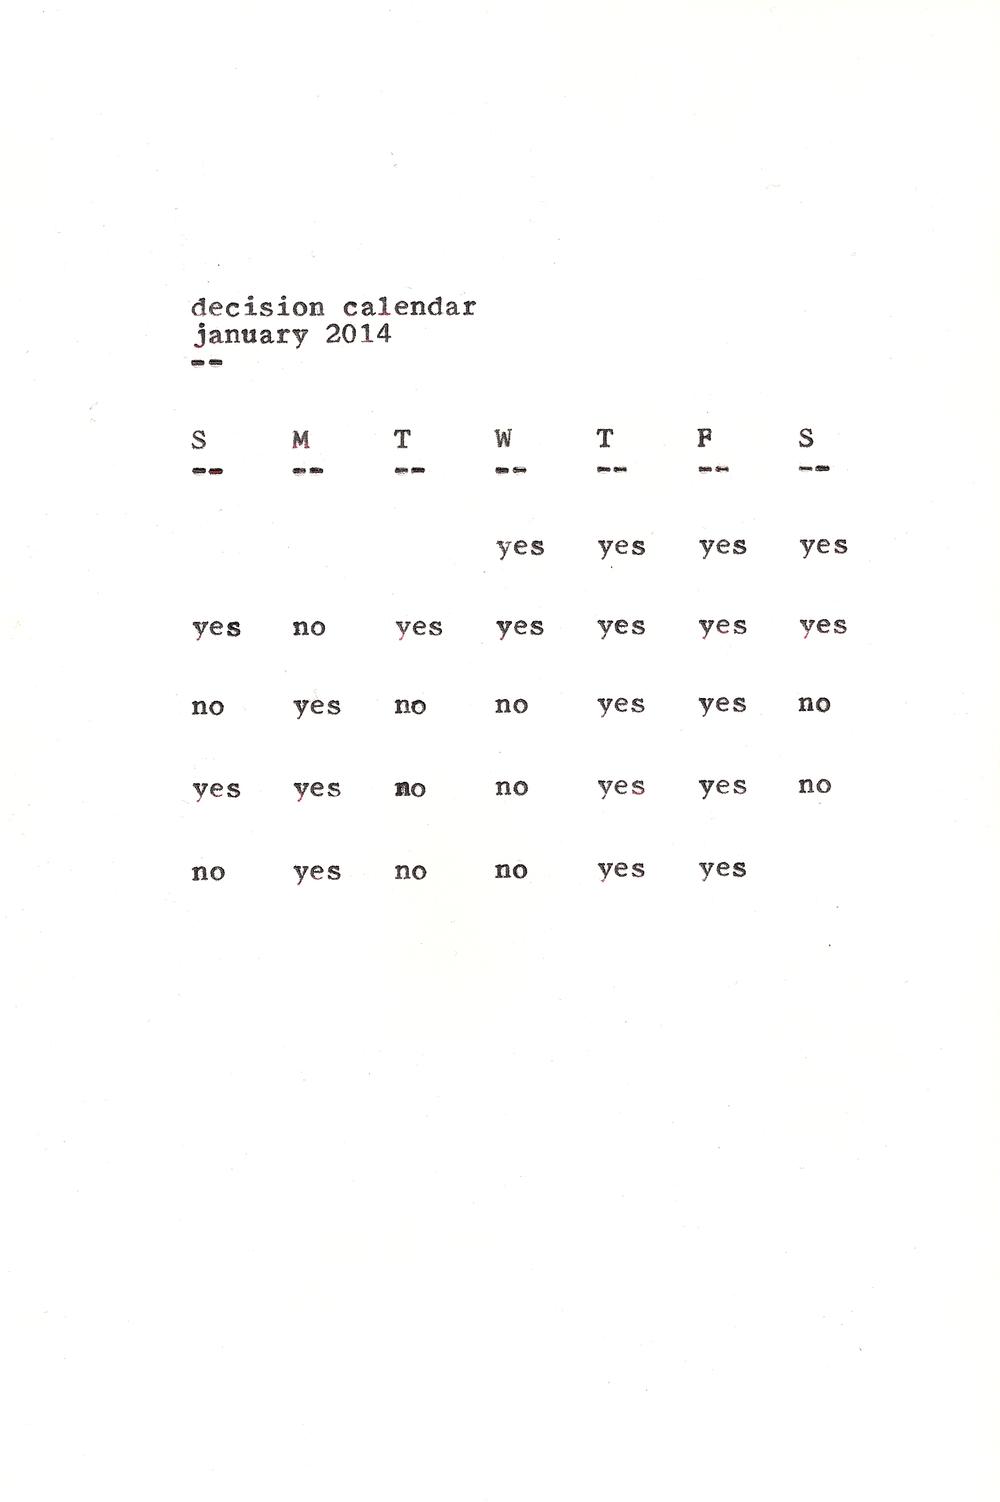 Jack_Decision_Calendar_January_2013.jpg